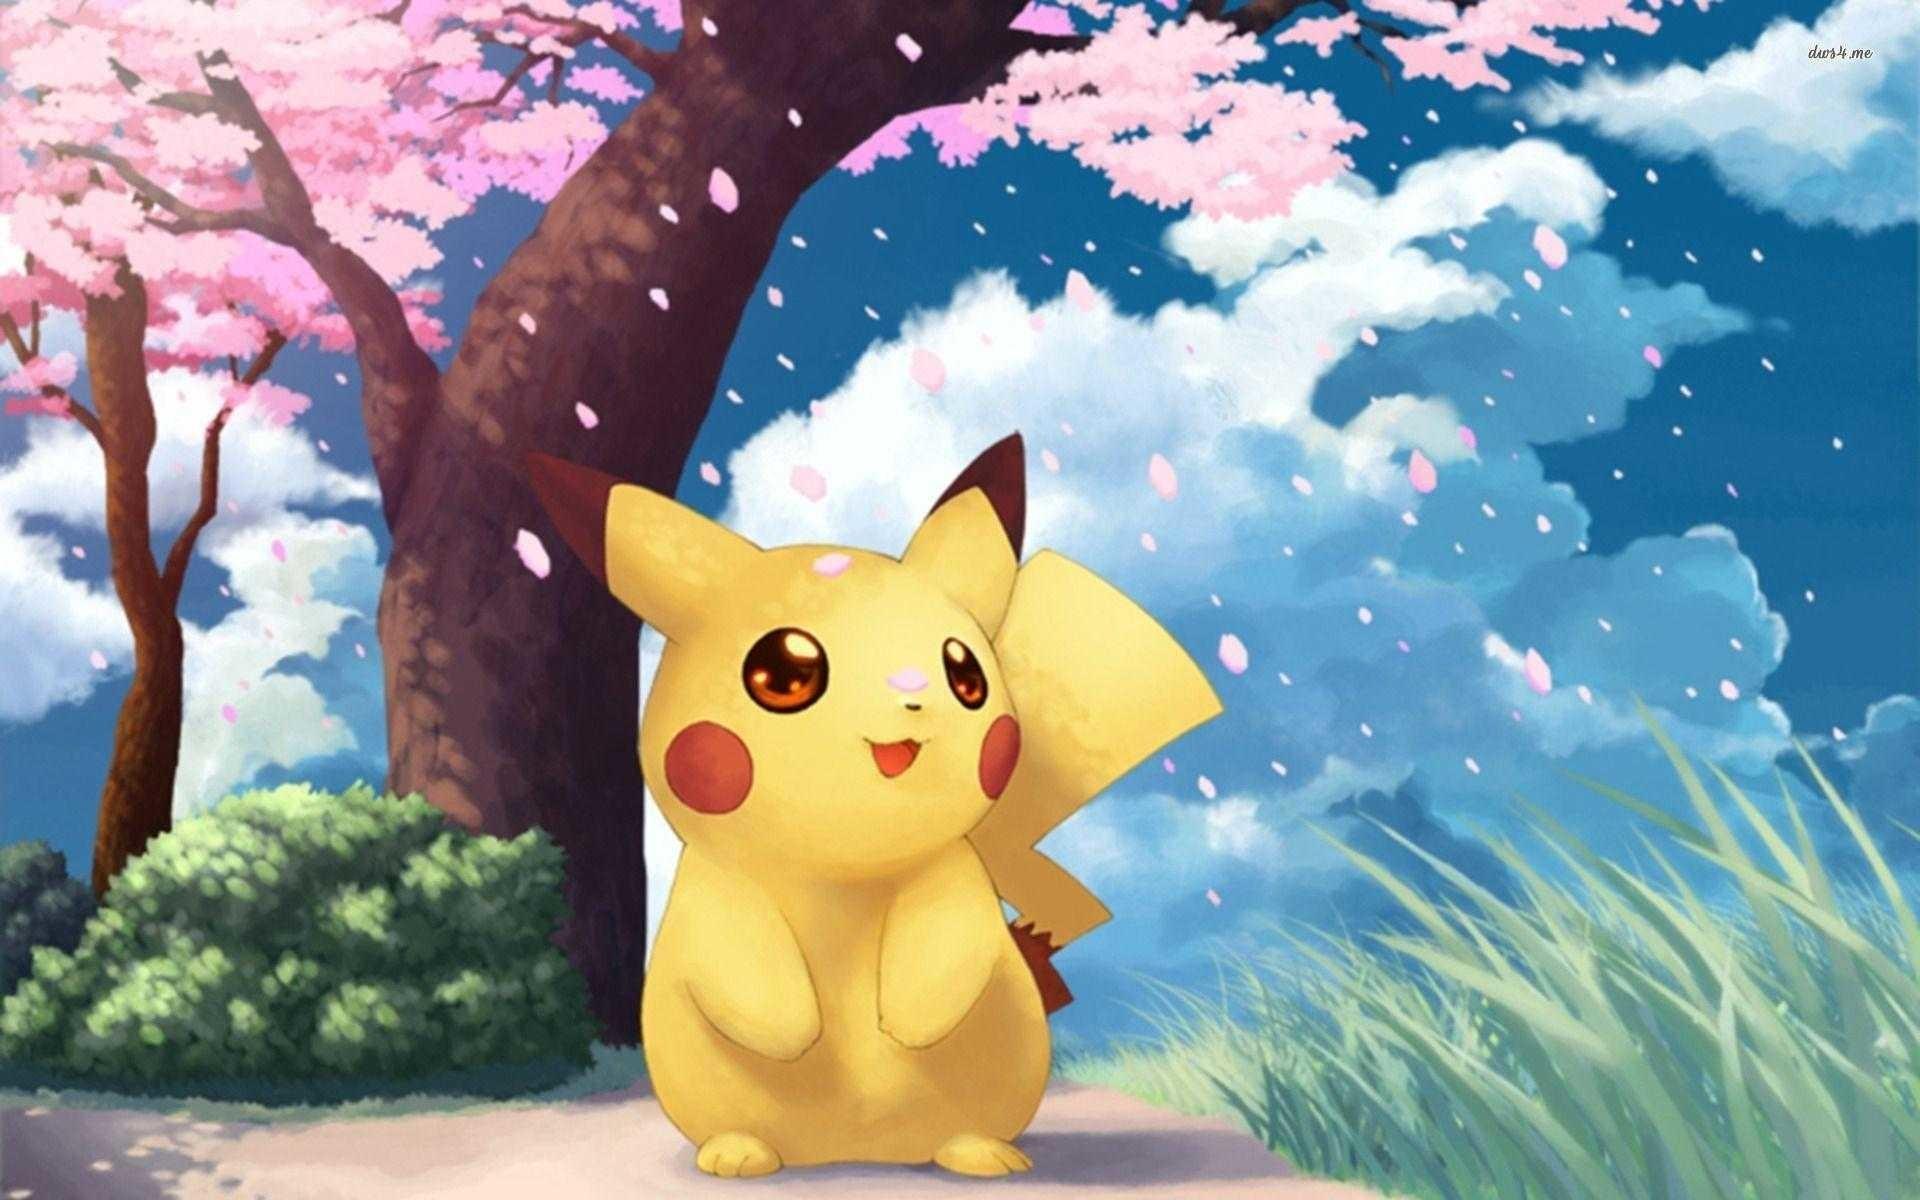 Cute Pokemon Wallpaper (82+ images)